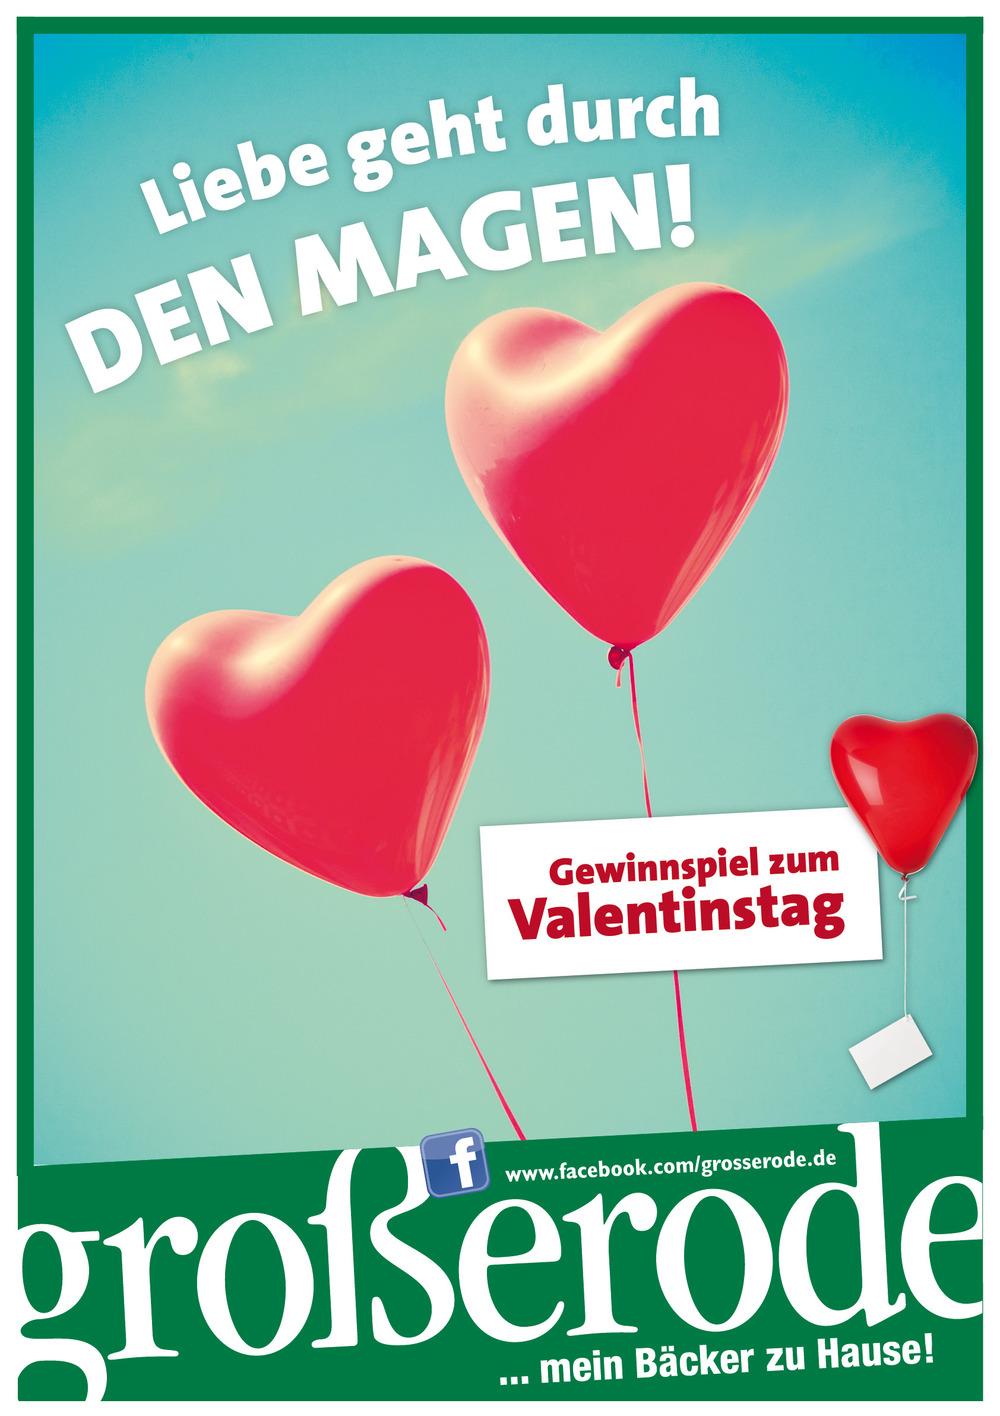 20150115_Grosserode_Valentinstag_Web.jpg